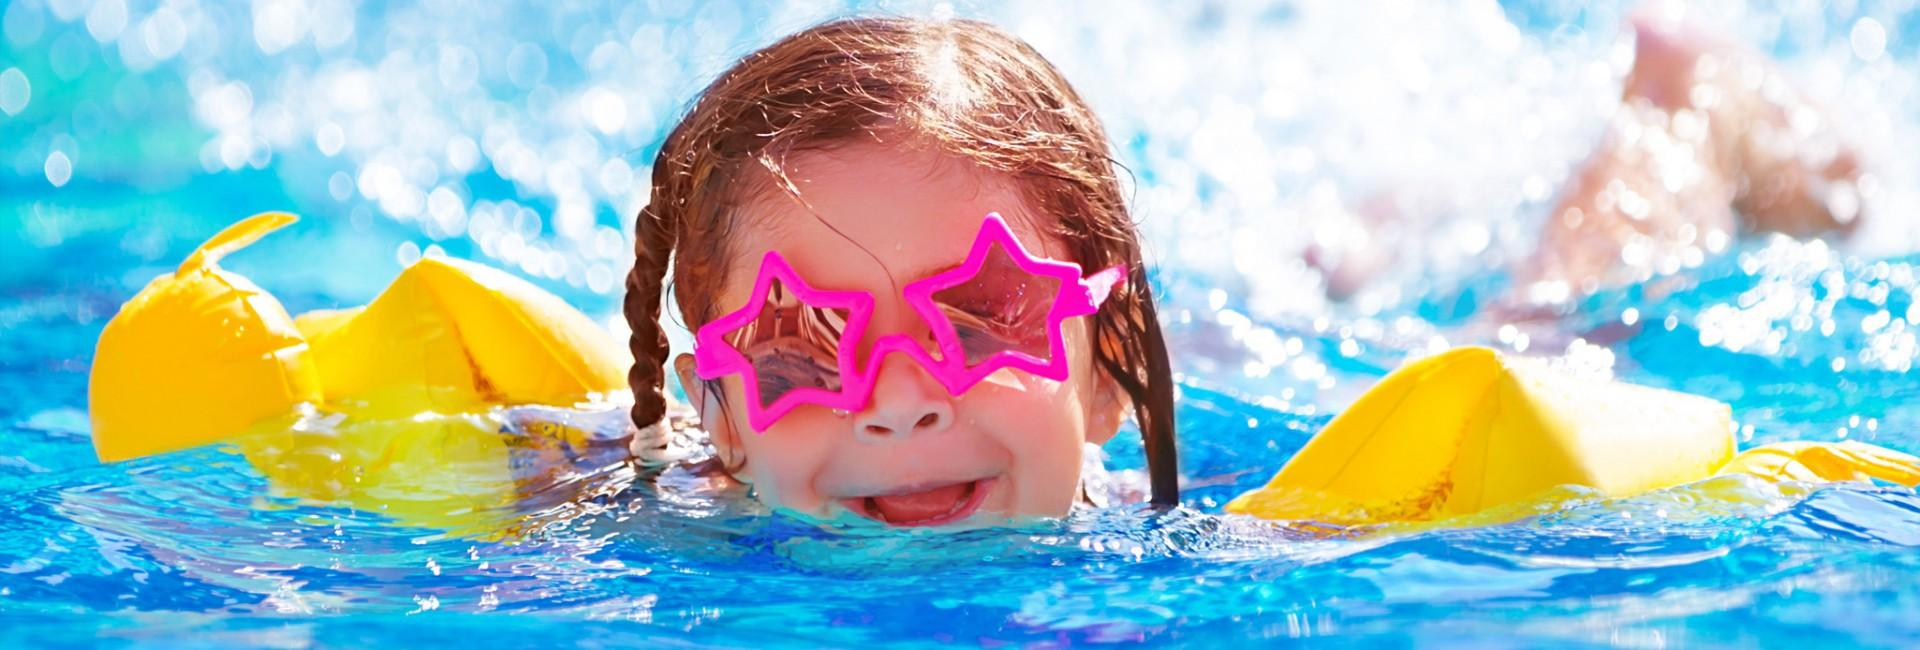 Rodan Schwimmschule, die beste Schwimmschule in Limburg!